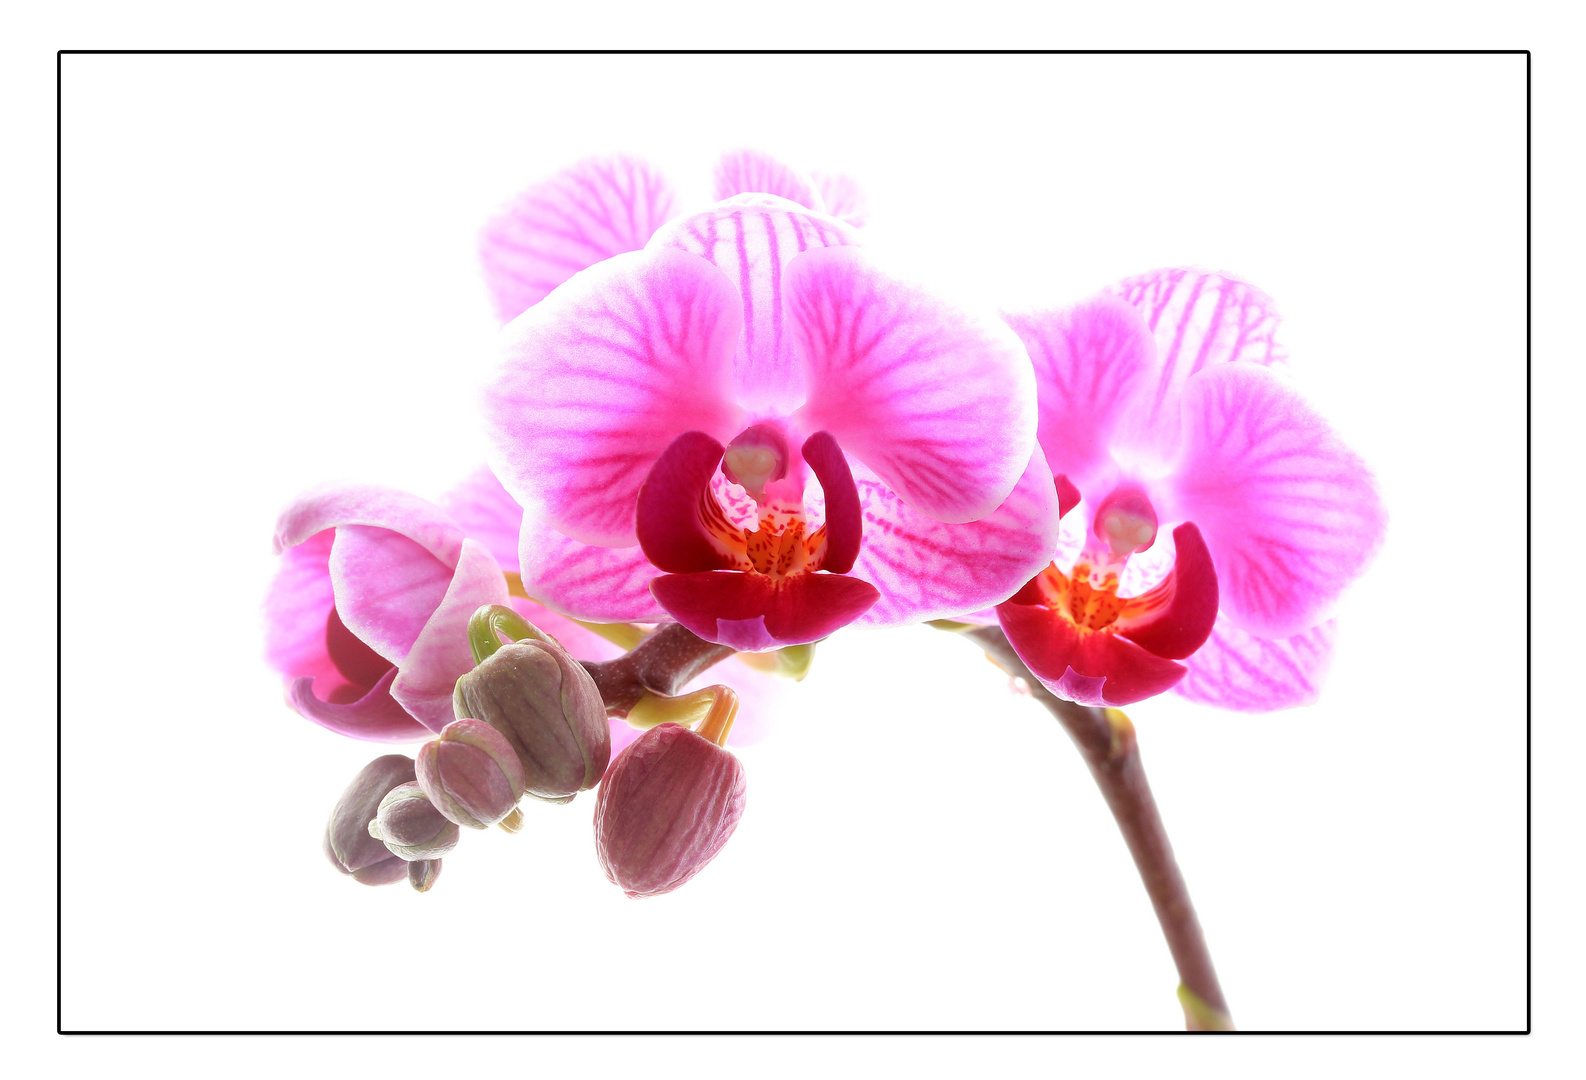 ~ phalaenopsis calimero ~